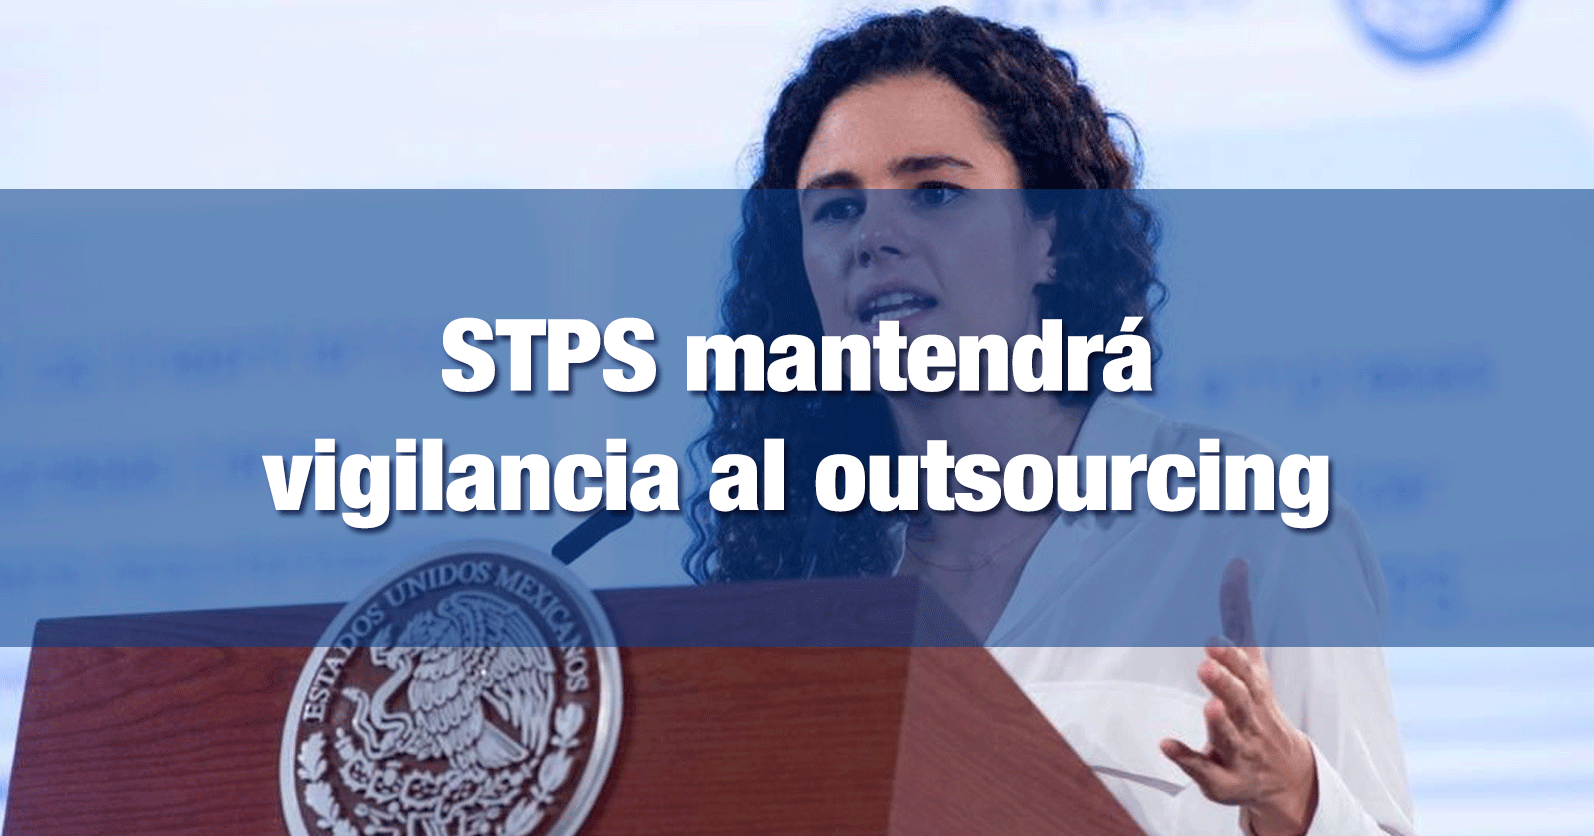 STPS mantendrá vigilancia al outsourcing